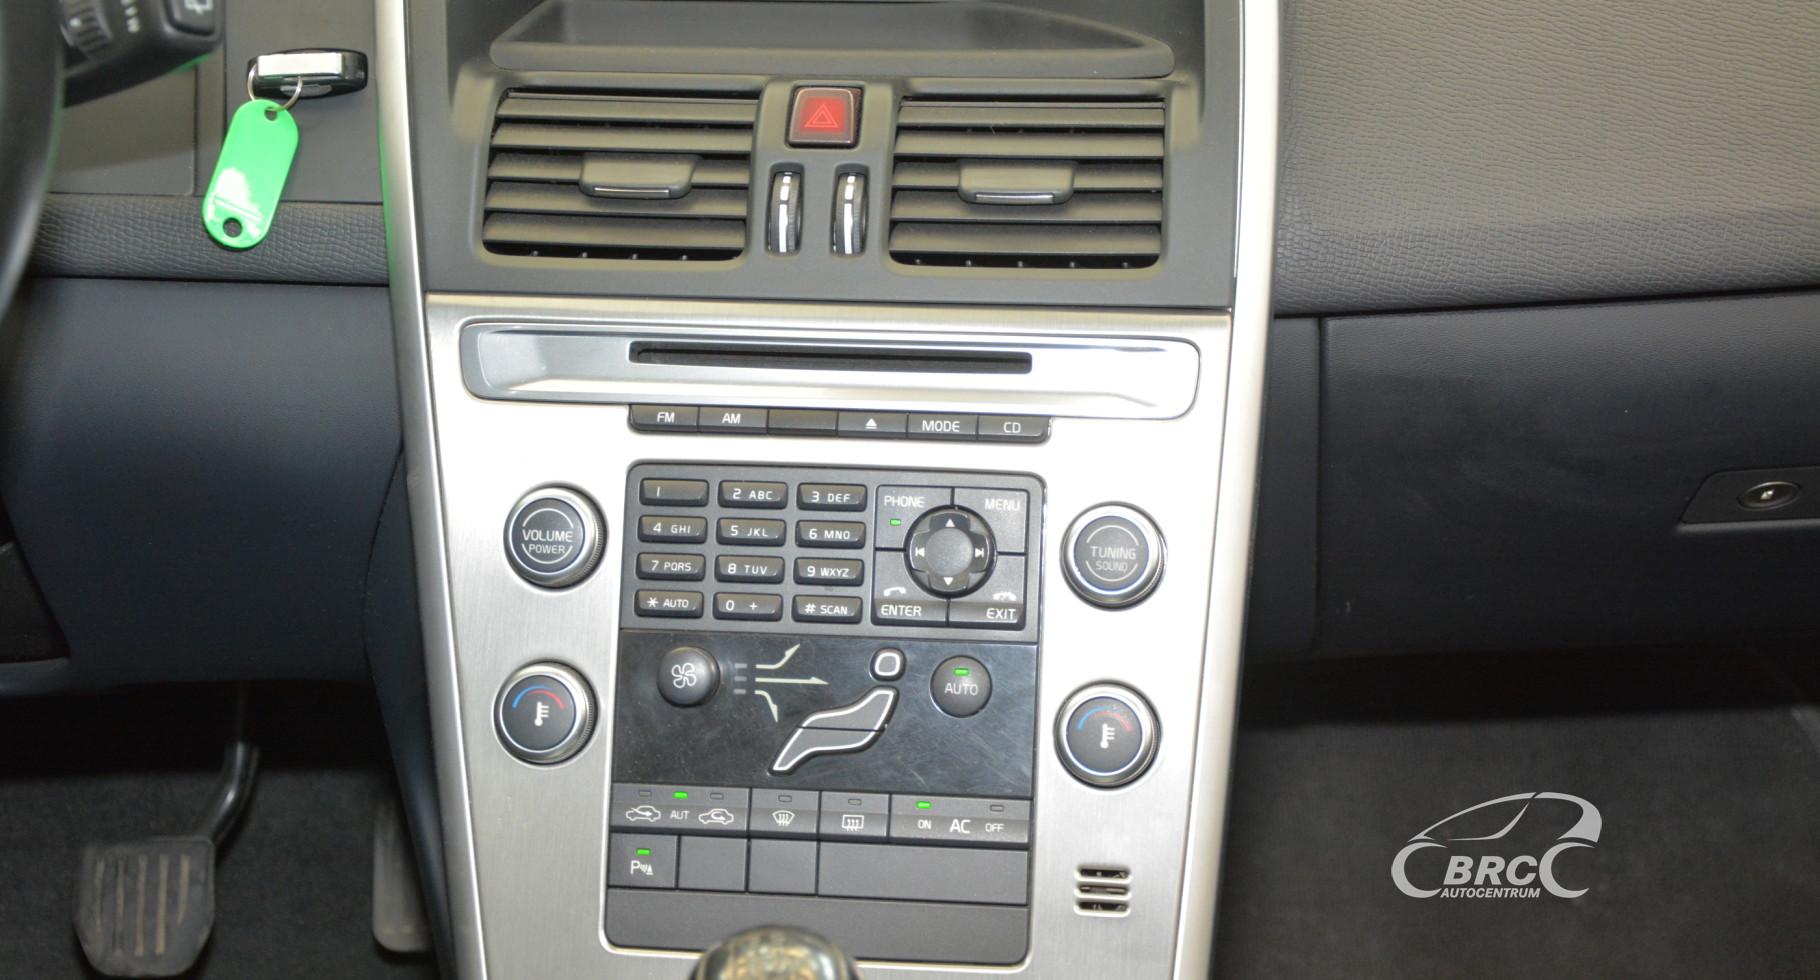 Volvo XC 60 2.4 D Drive Momentum